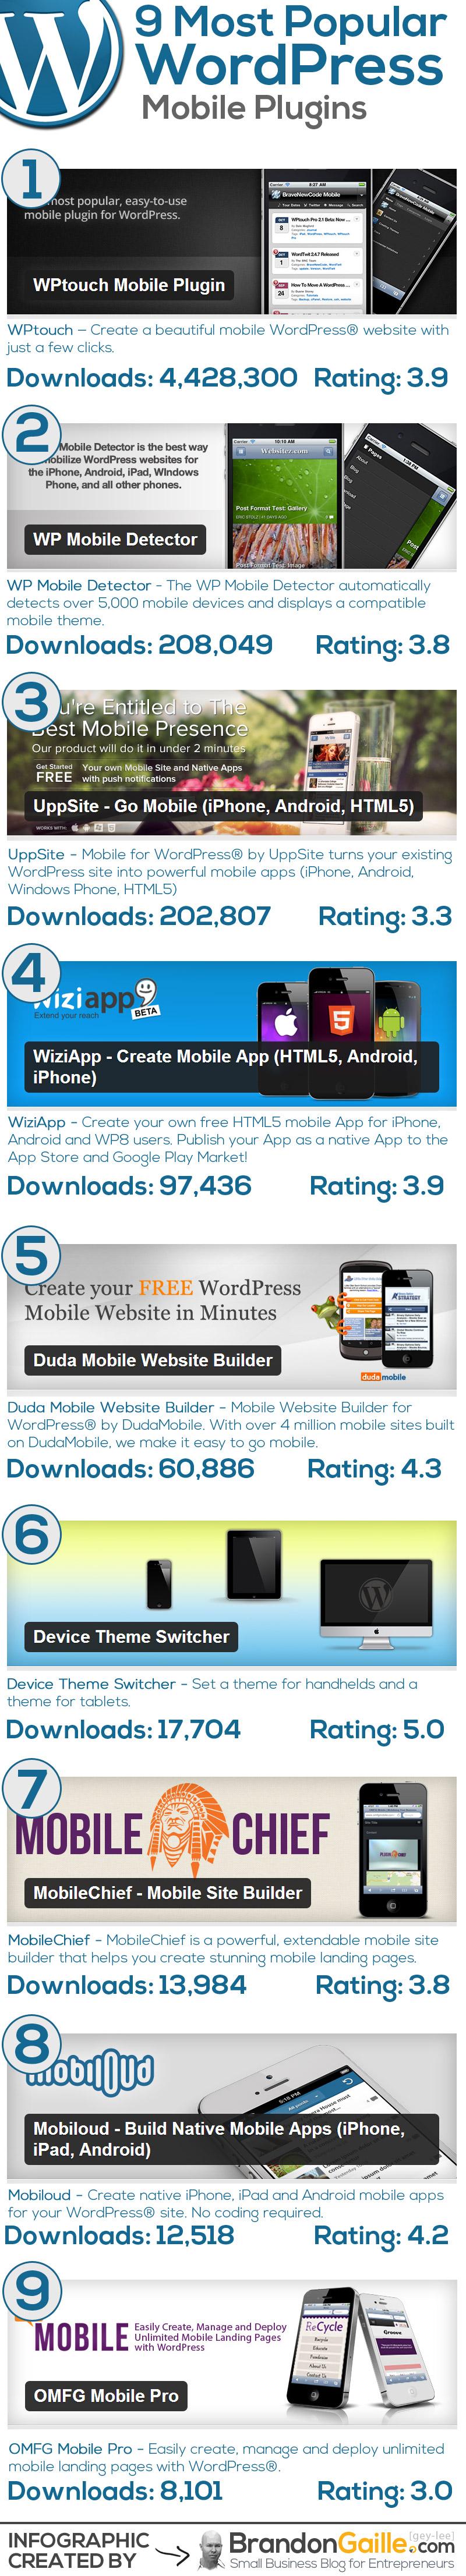 Best-Wordpress-Mobile-Plugins-Infographic